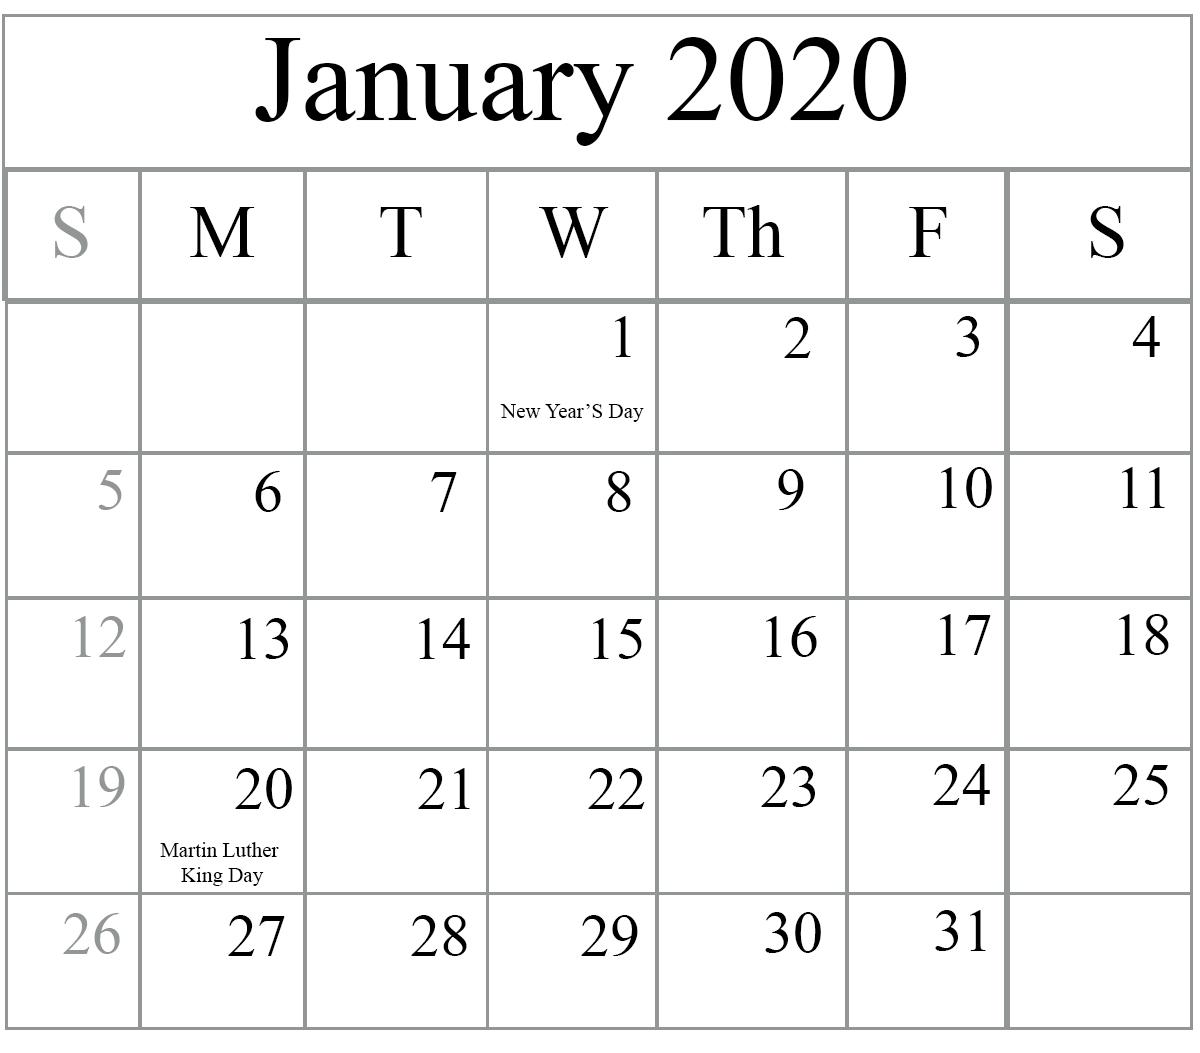 Blank January 2020 Calendar Printable In Pdf, Word, Excel-January 2020 Calendar Xl